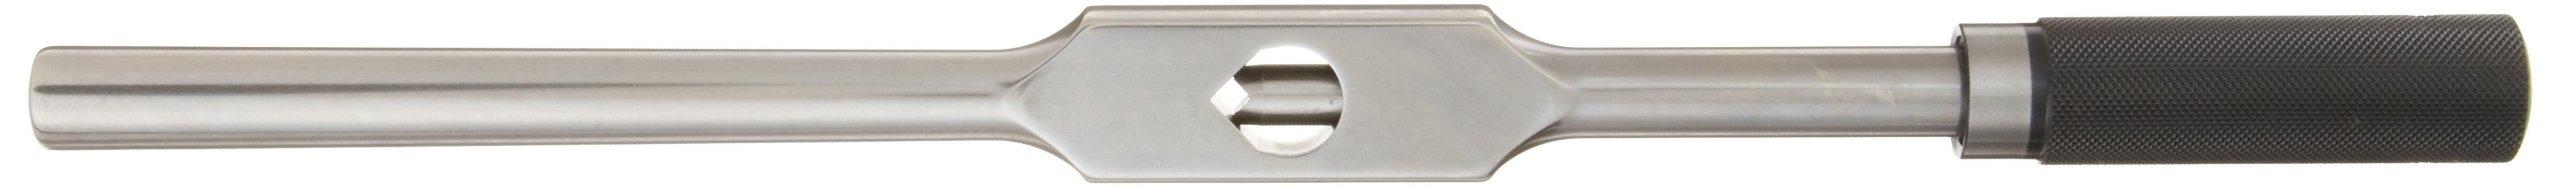 "Starrett 91D Tap Wrench, 5/16"" - 3/4"" Tap Size, 13/64"" - 7/16"" Square Shank Diameter, 16"" Body Length"